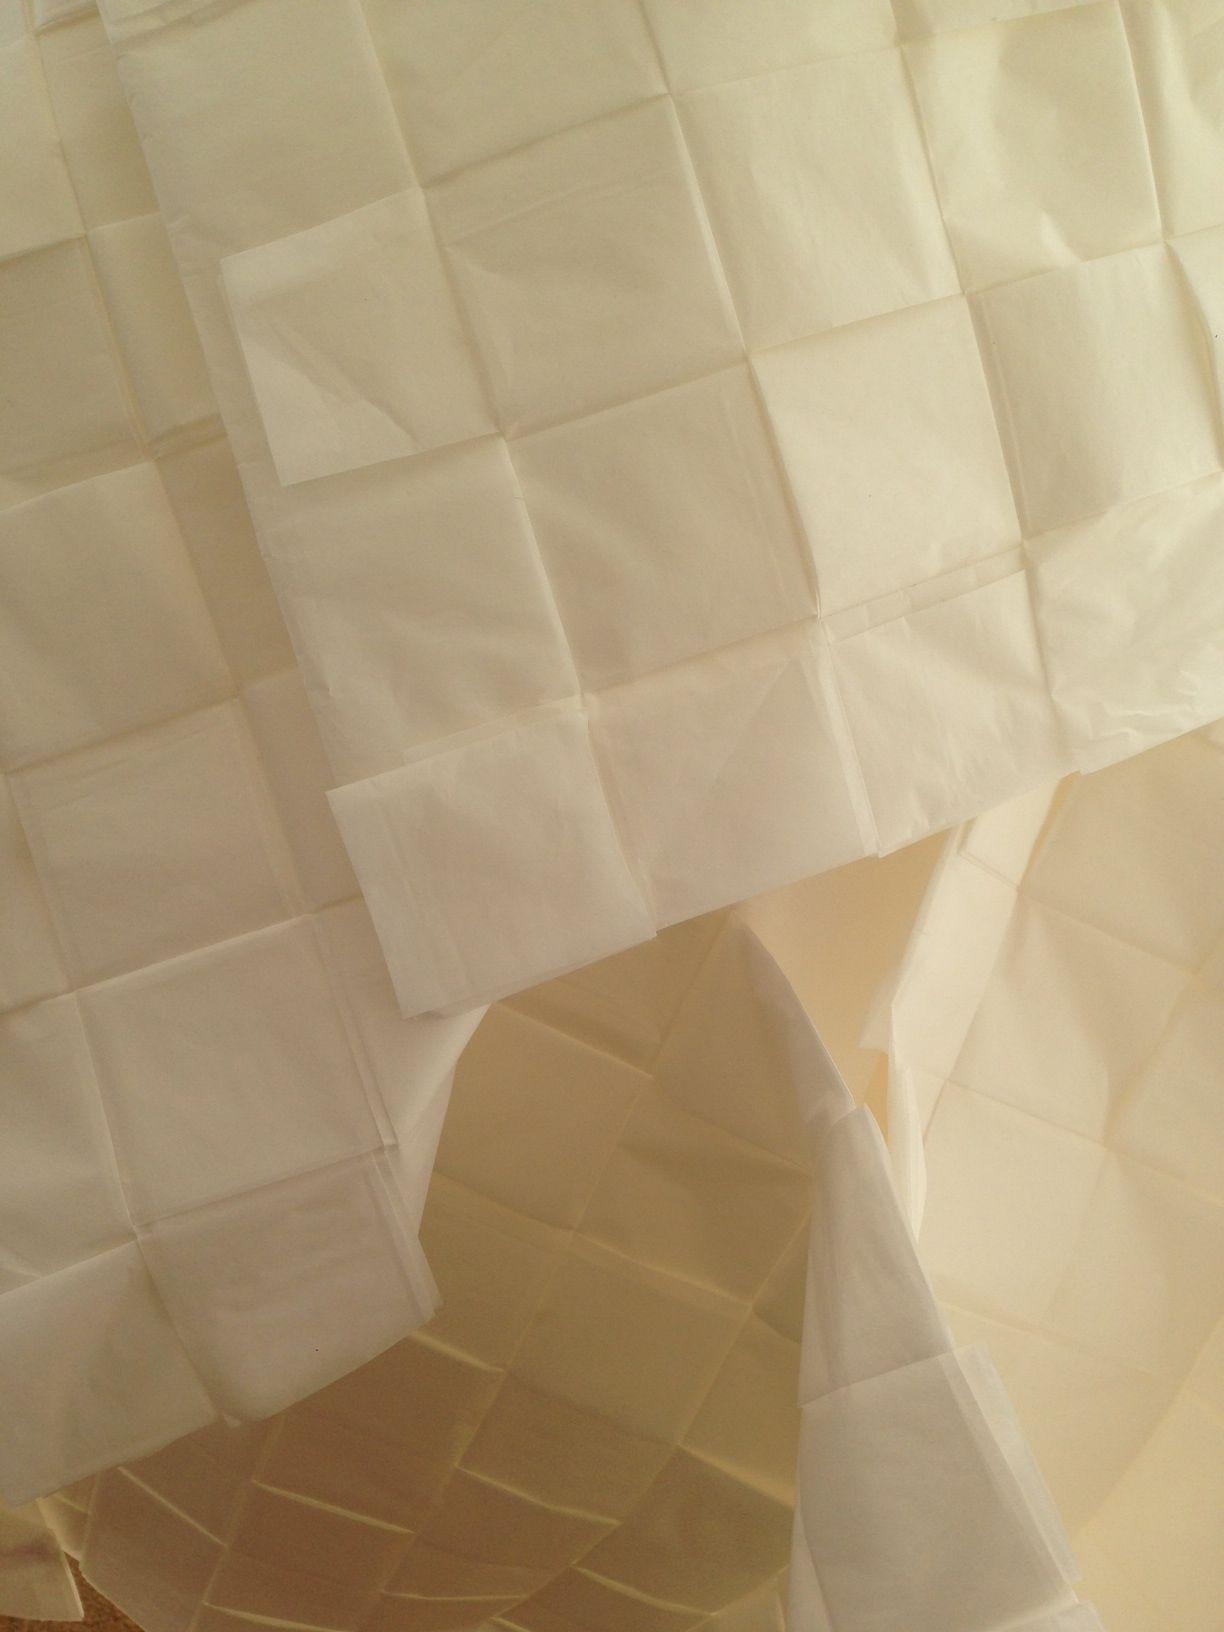 paper manipulation woven